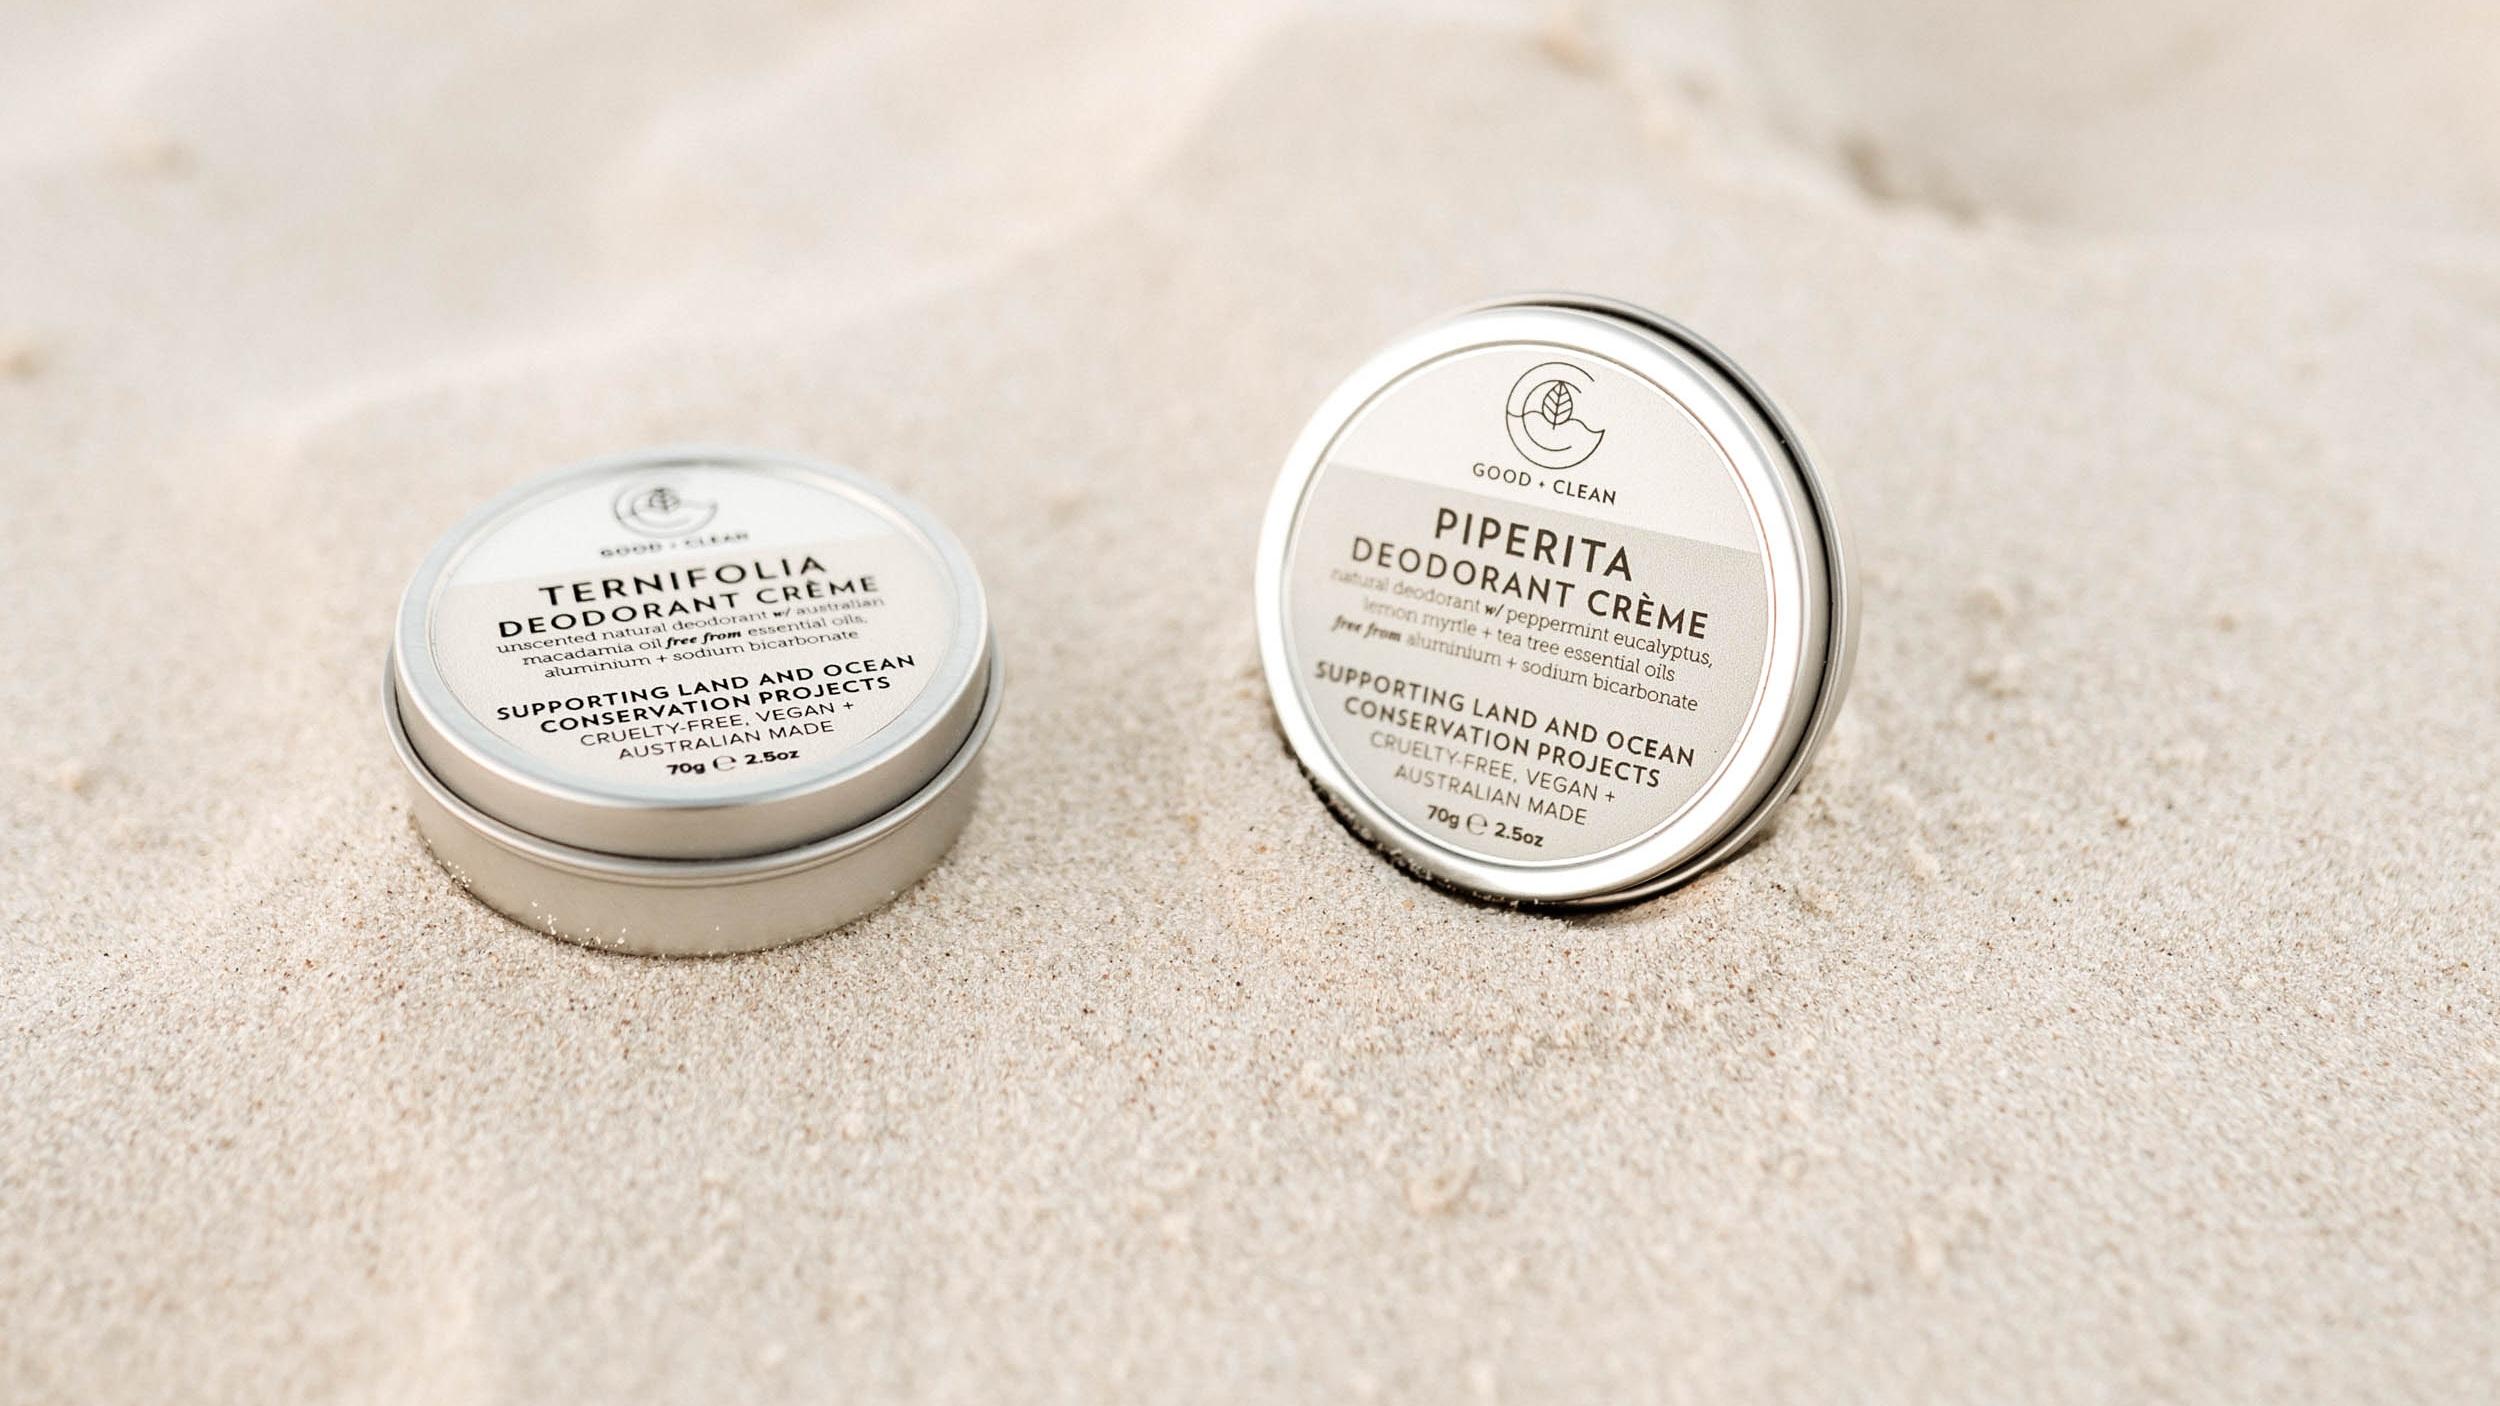 keira-mason-good-and-clean-deodorant-in-the-sandjpg.jpg